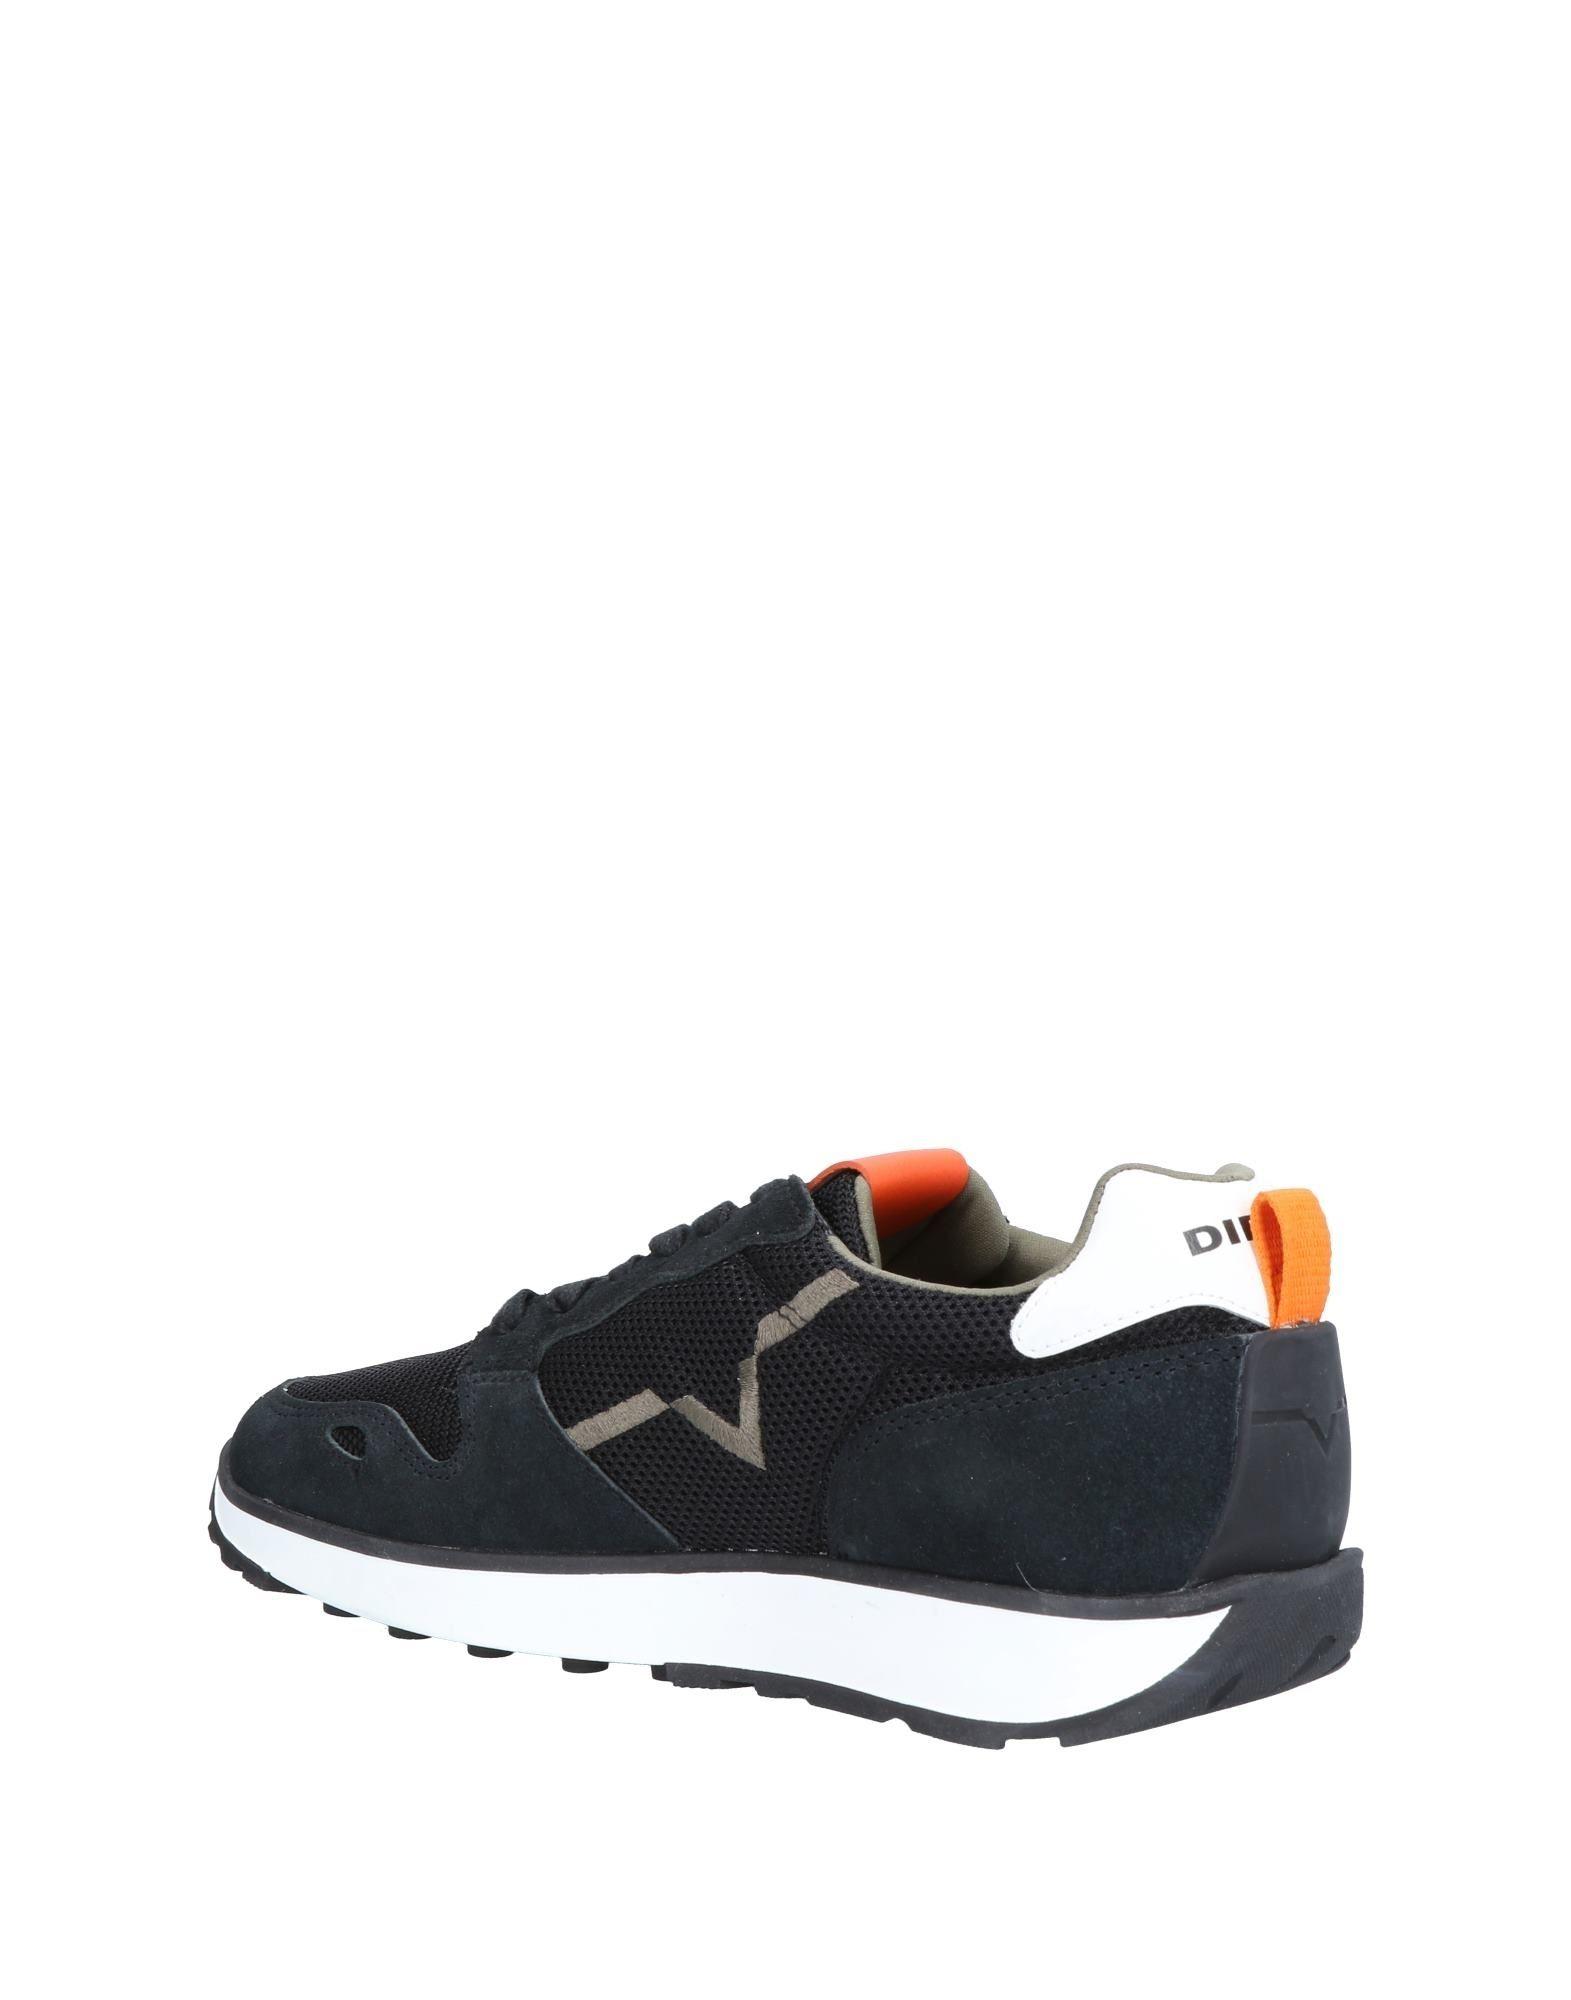 Rabatt echte Schuhe 11496919VI Diesel Sneakers Herren  11496919VI Schuhe 6a7716